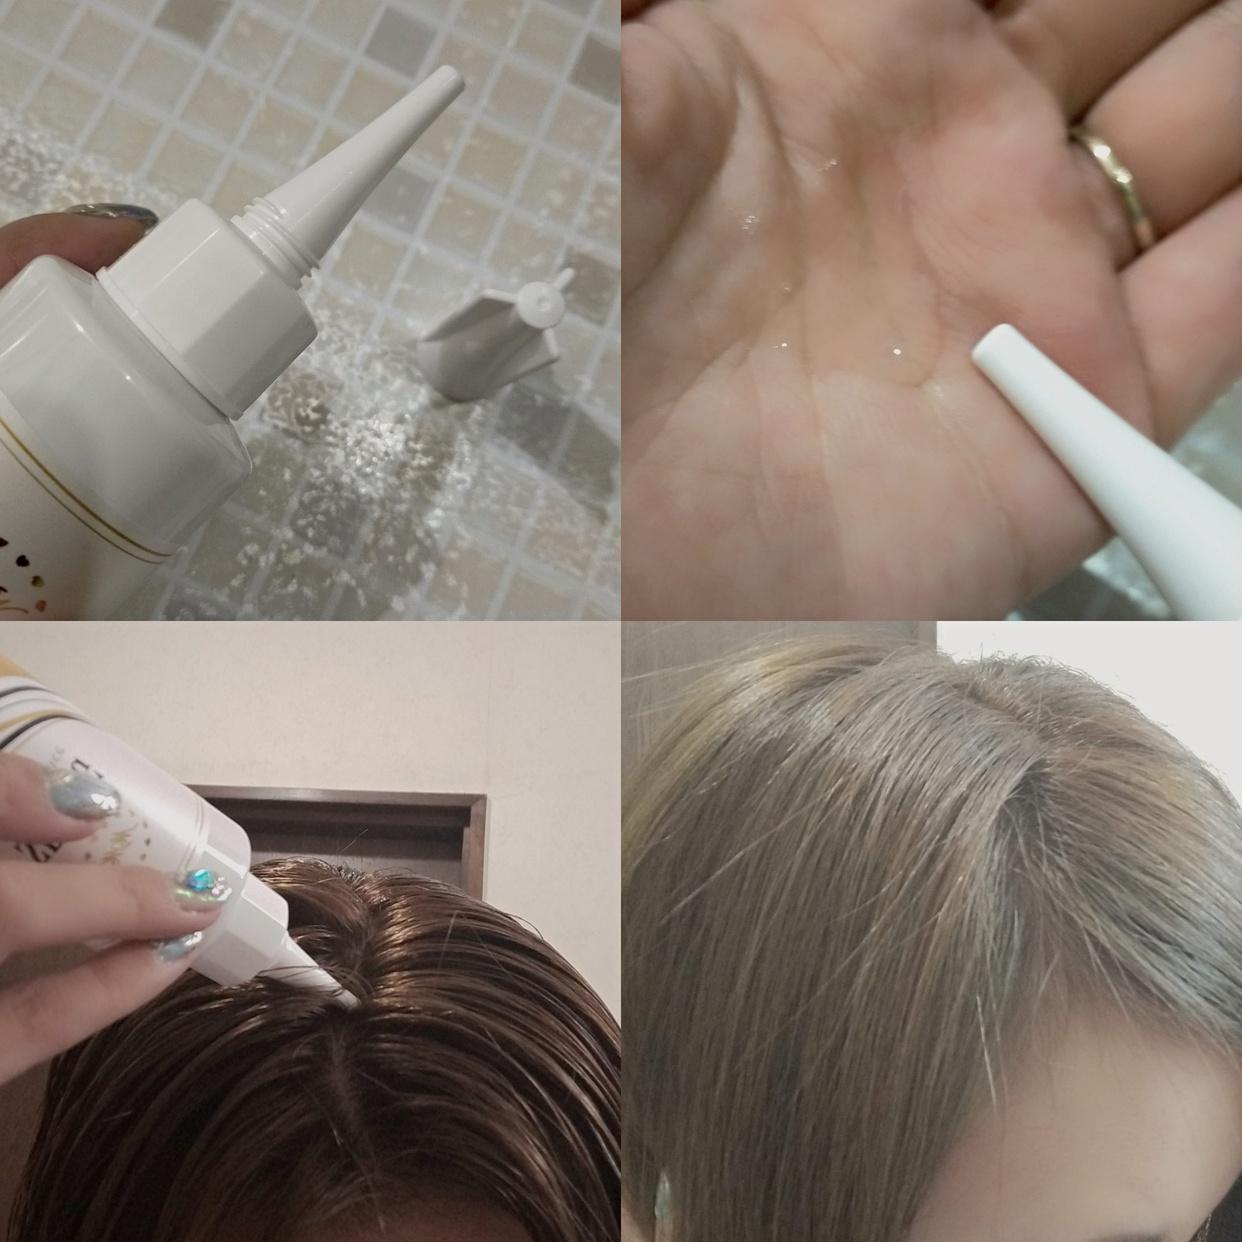 SPRING(スプリング)薬用 育毛 エッセンスを使ったみこさんのクチコミ画像2